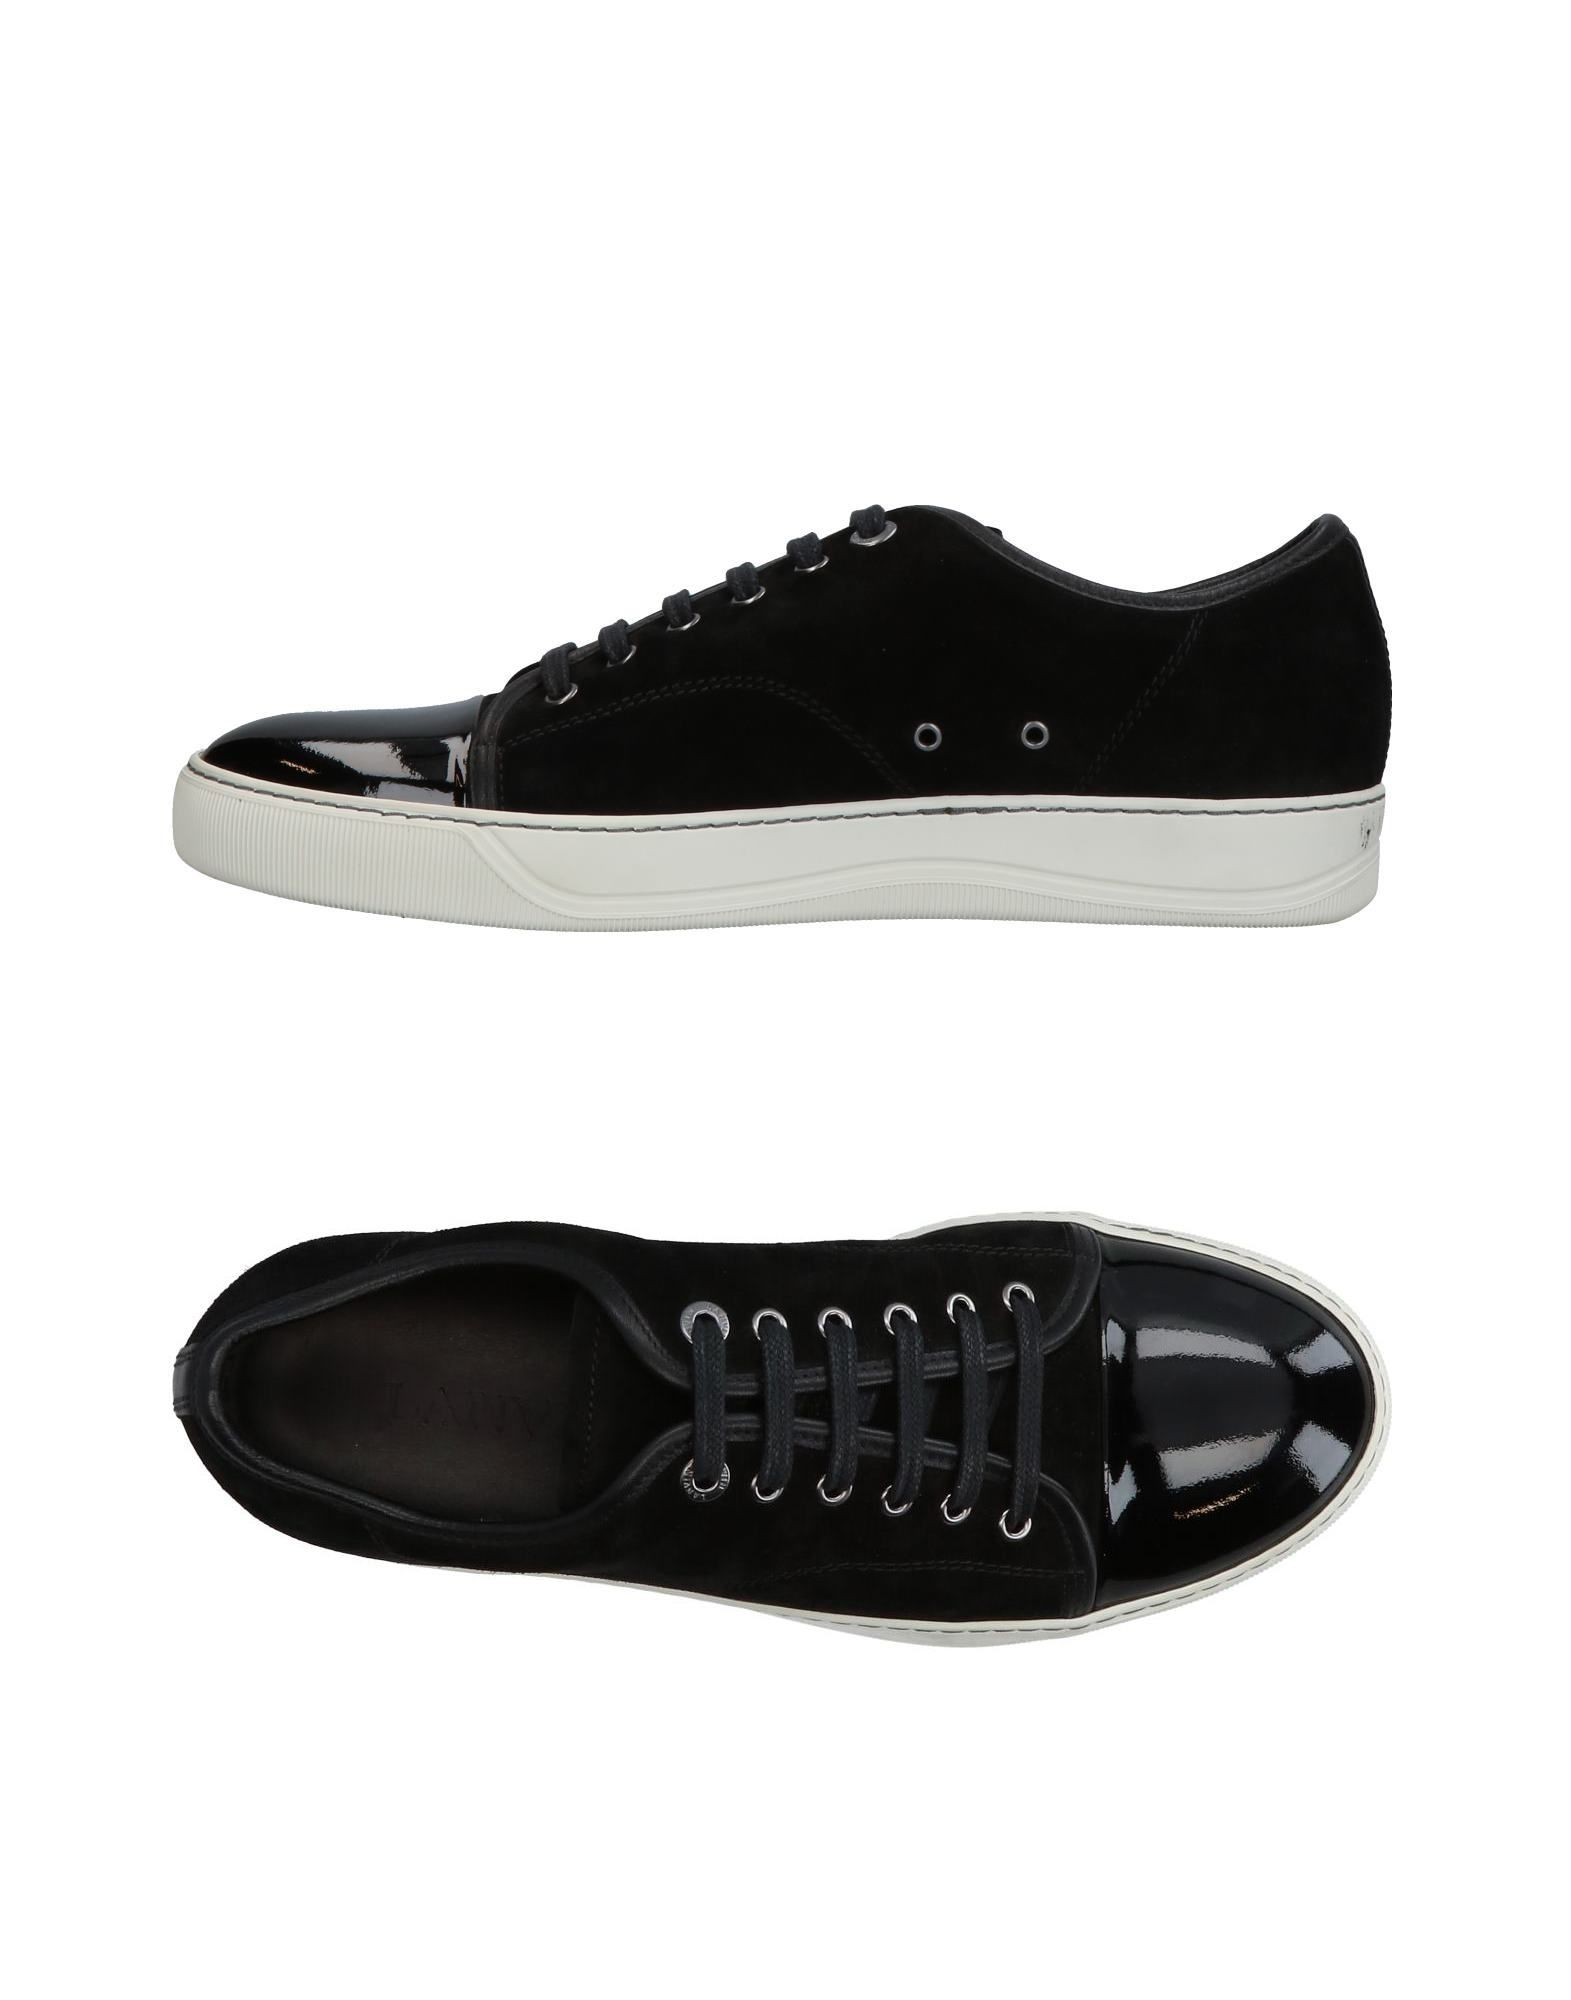 Lanvin Sneakers Herren  11327396BV Gute Qualität beliebte Schuhe